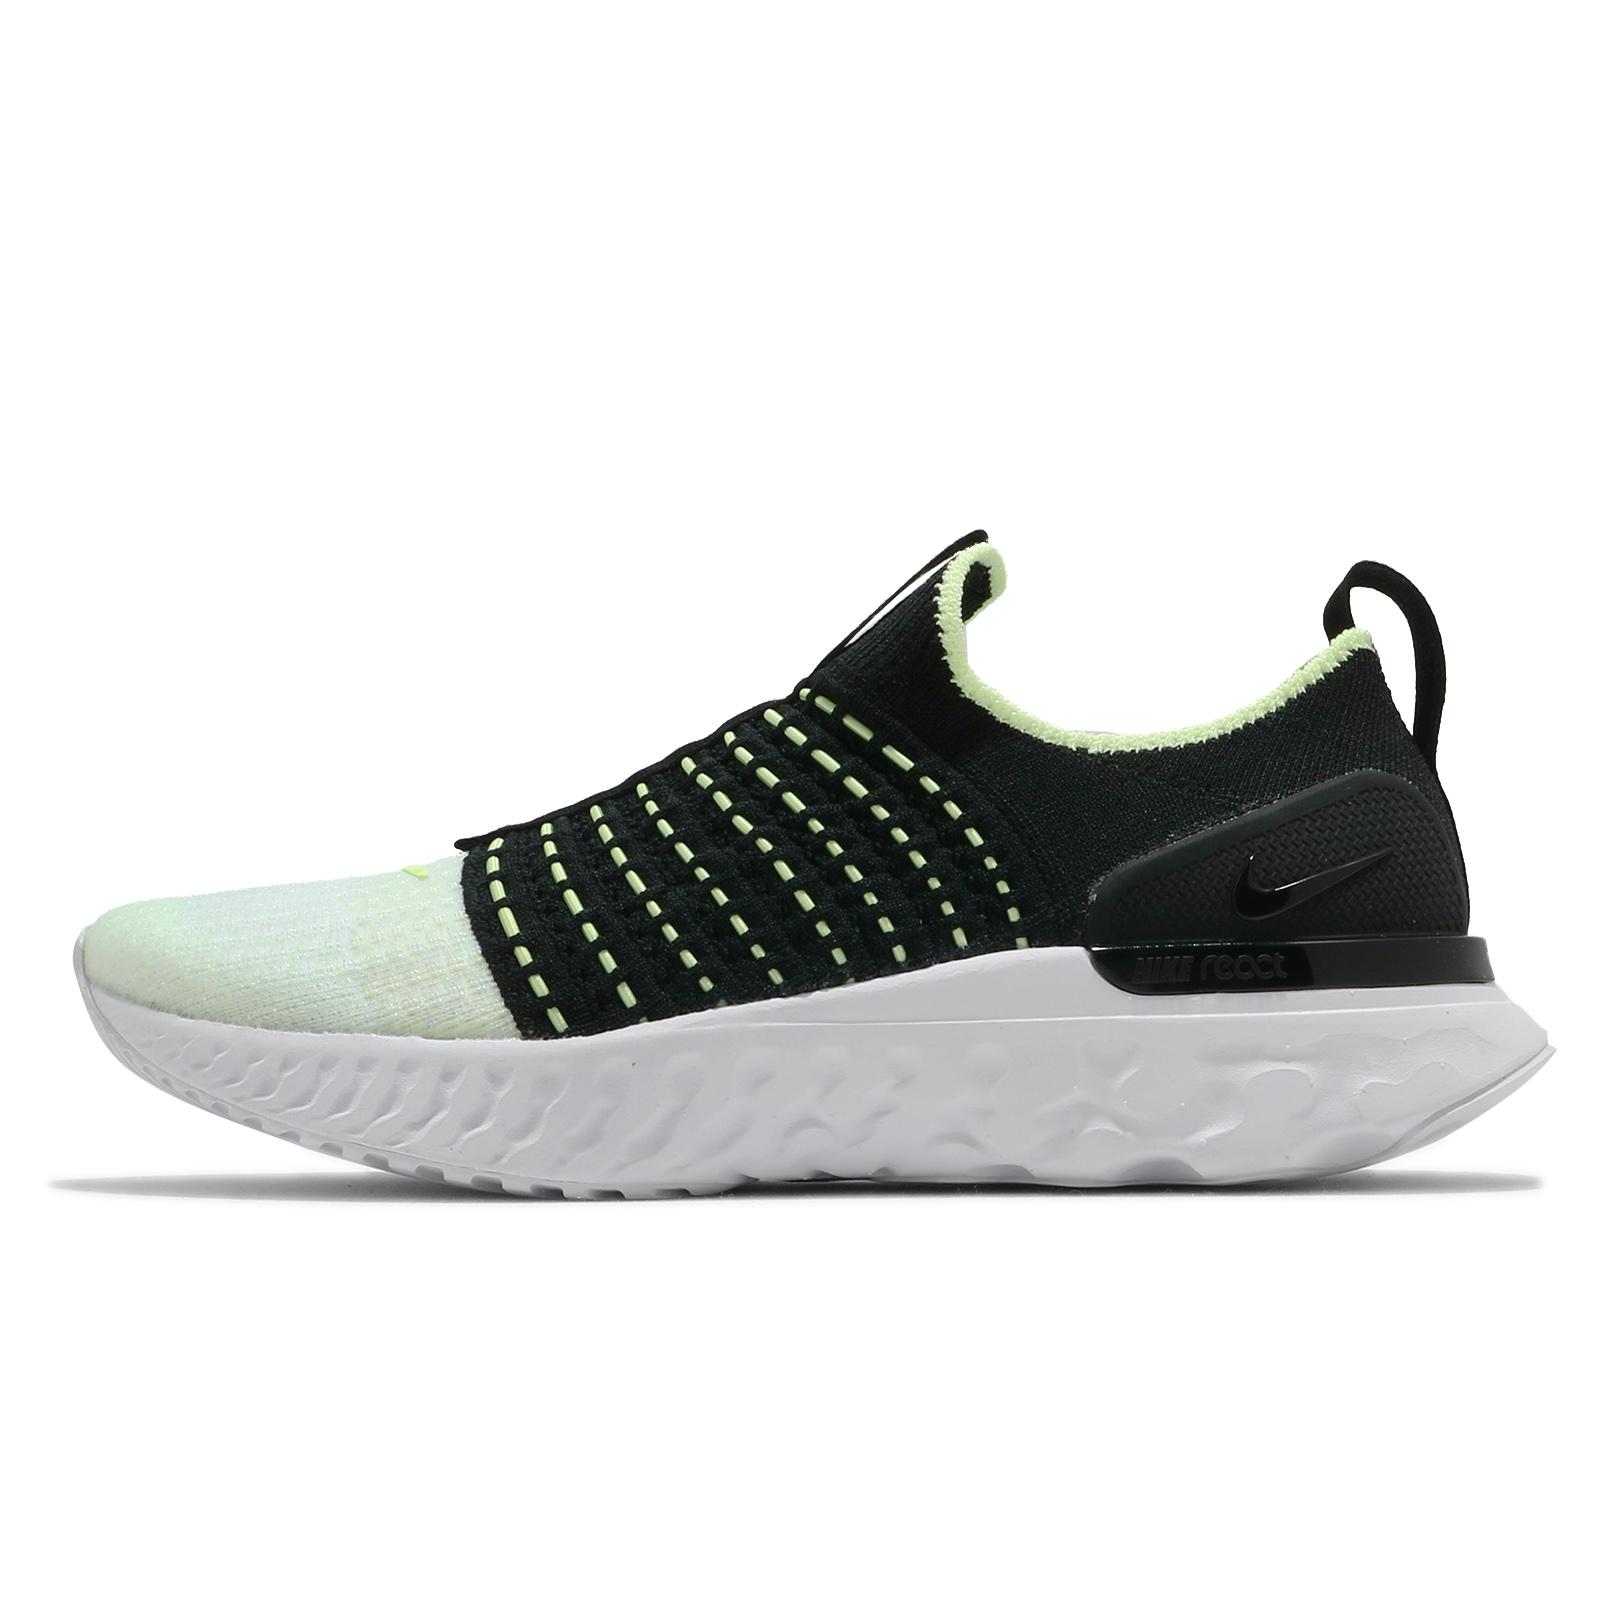 Nike 慢跑鞋 React Phantom Run FK 2 黑 綠 女鞋 運動鞋【ACS】 CJ0280-004